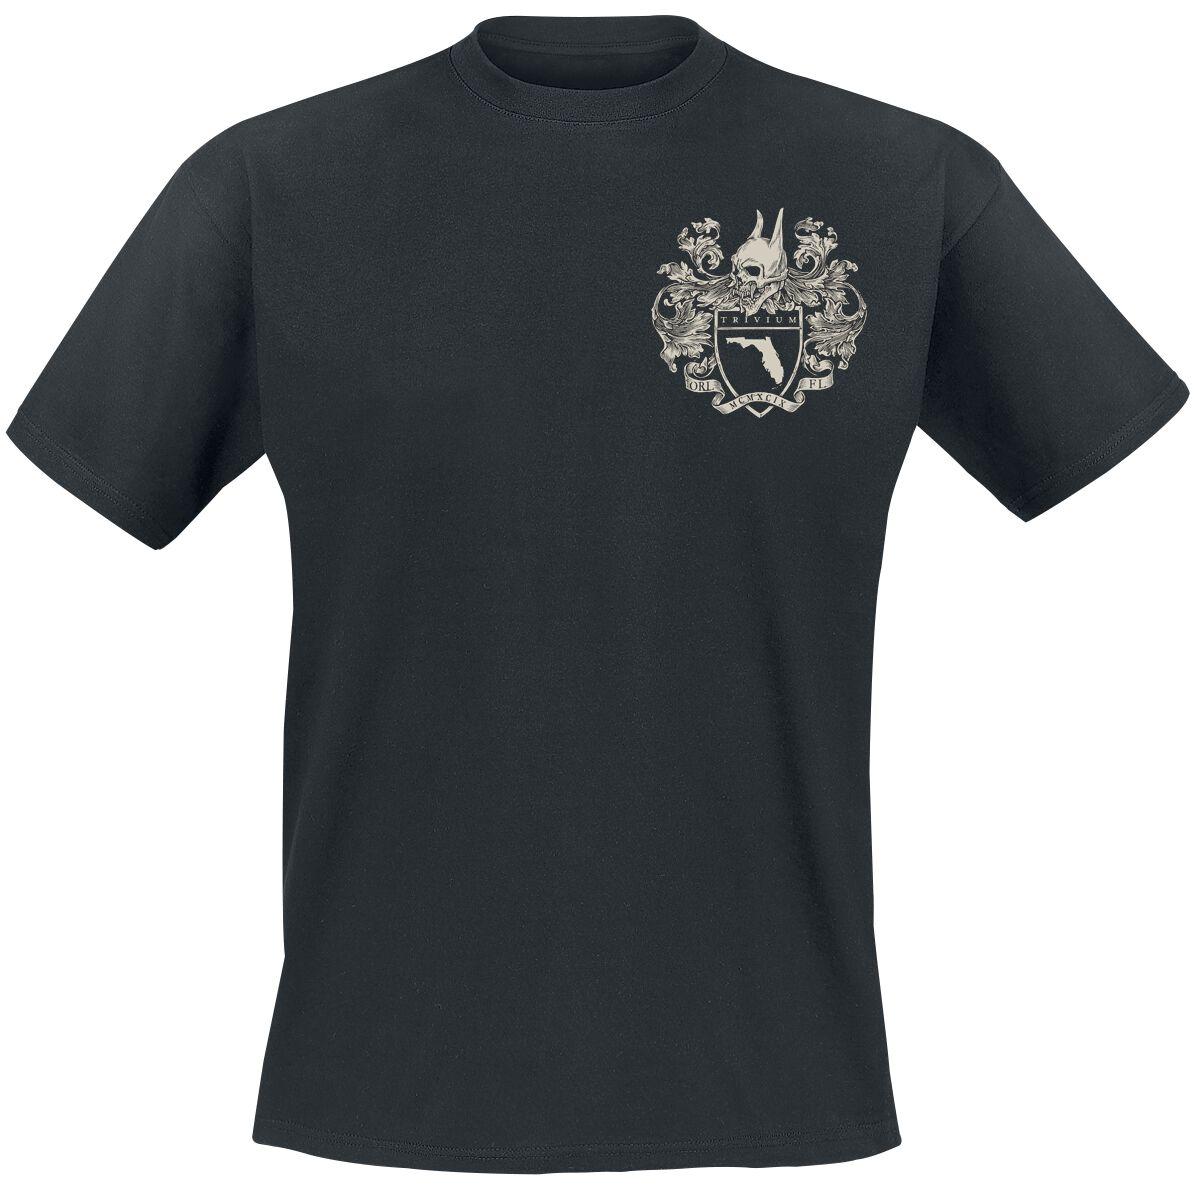 Zespoły - Koszulki - T-Shirt Trivium Oni Orlando T-Shirt czarny - 368195